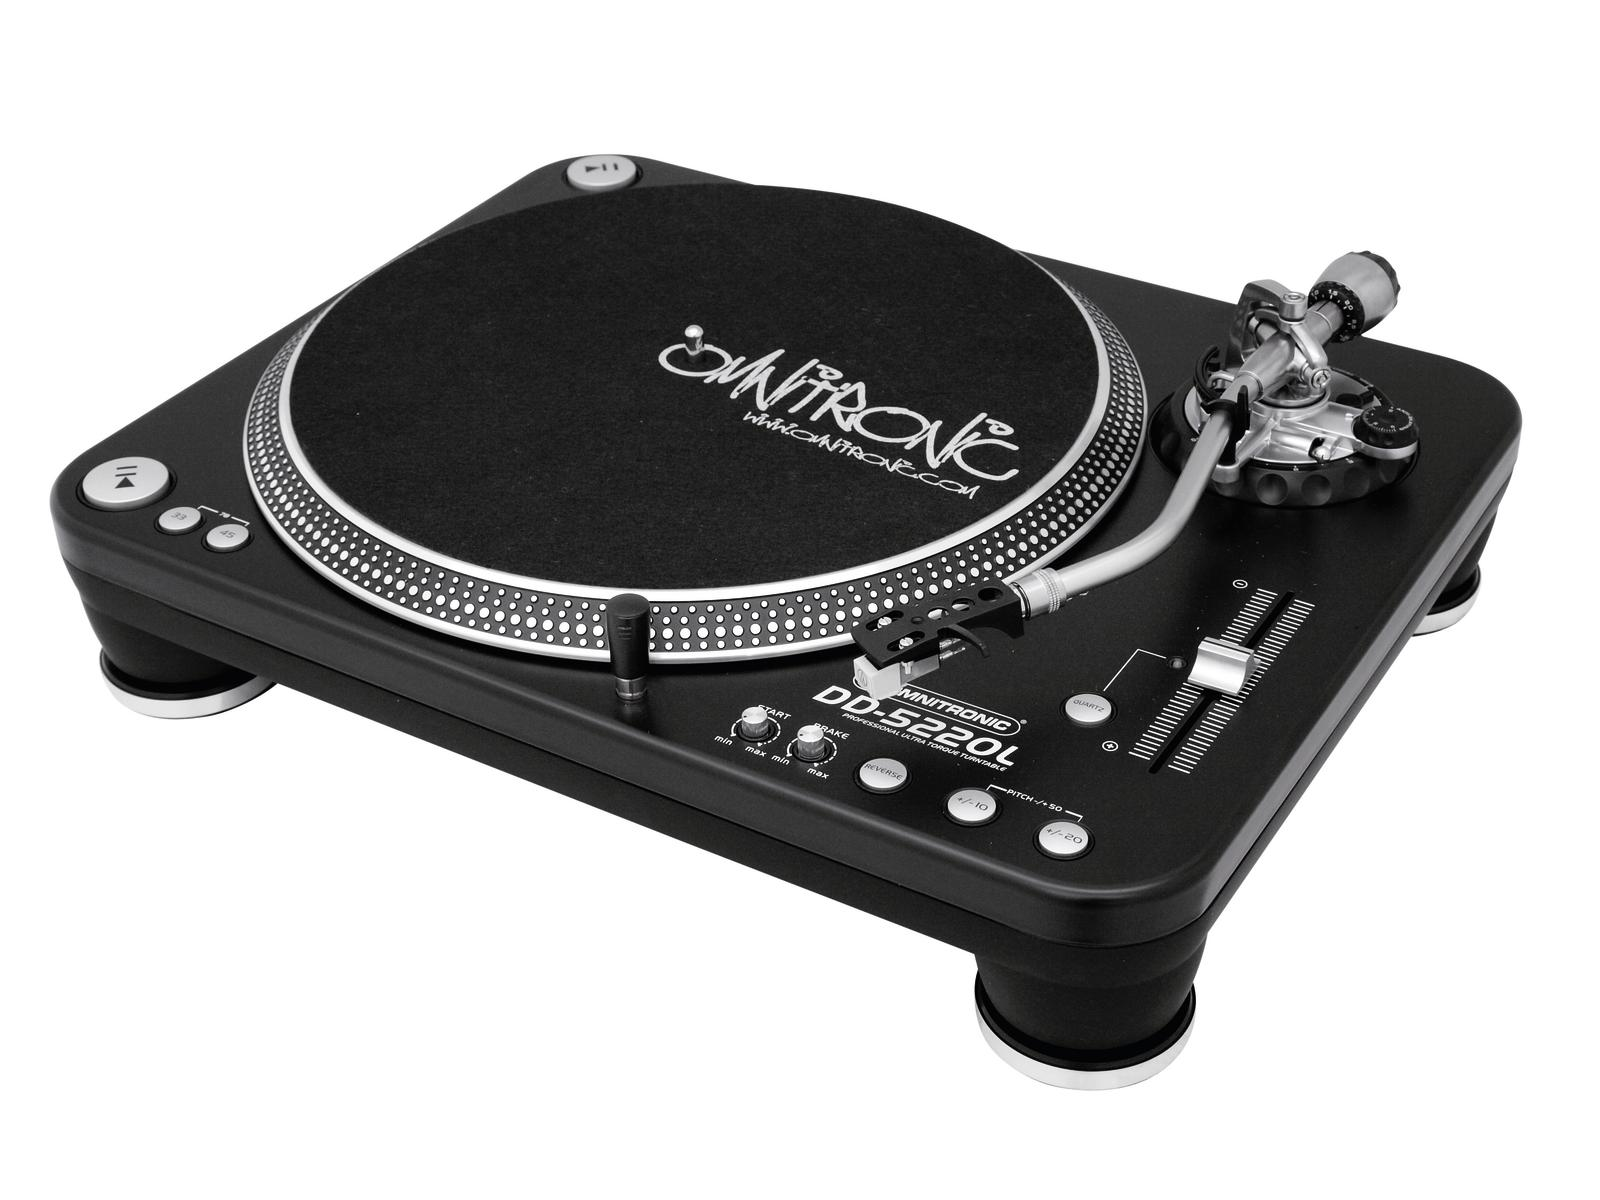 Turntable Platter direct drive OMNITRONIC DD-5220L